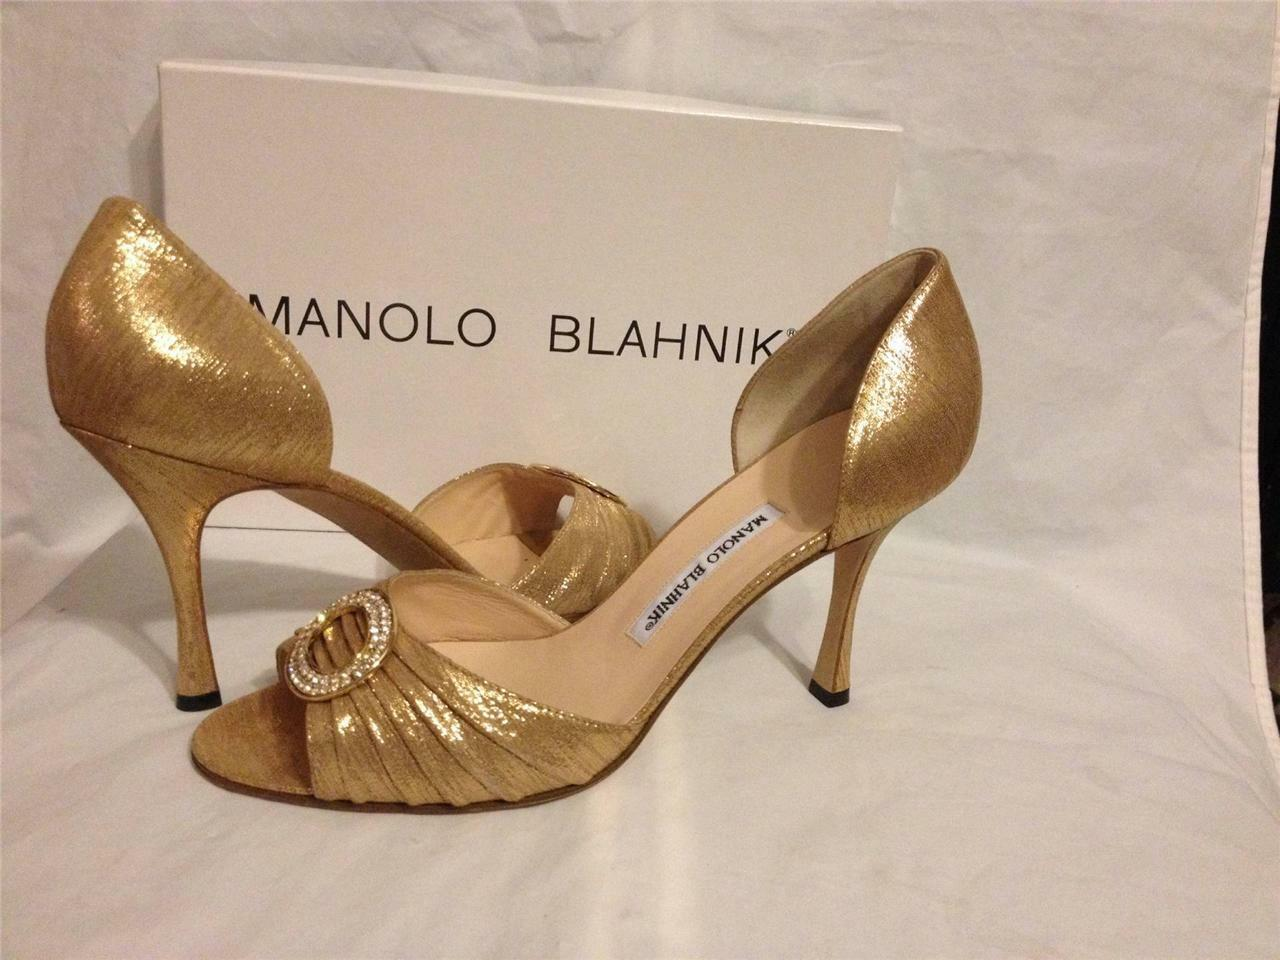 sport caldi Manolo Blahnik SEDARABY D'Orsay oro Leather Jewel Crystal Pump Pump Pump Heels scarpe  755  fino al 42% di sconto